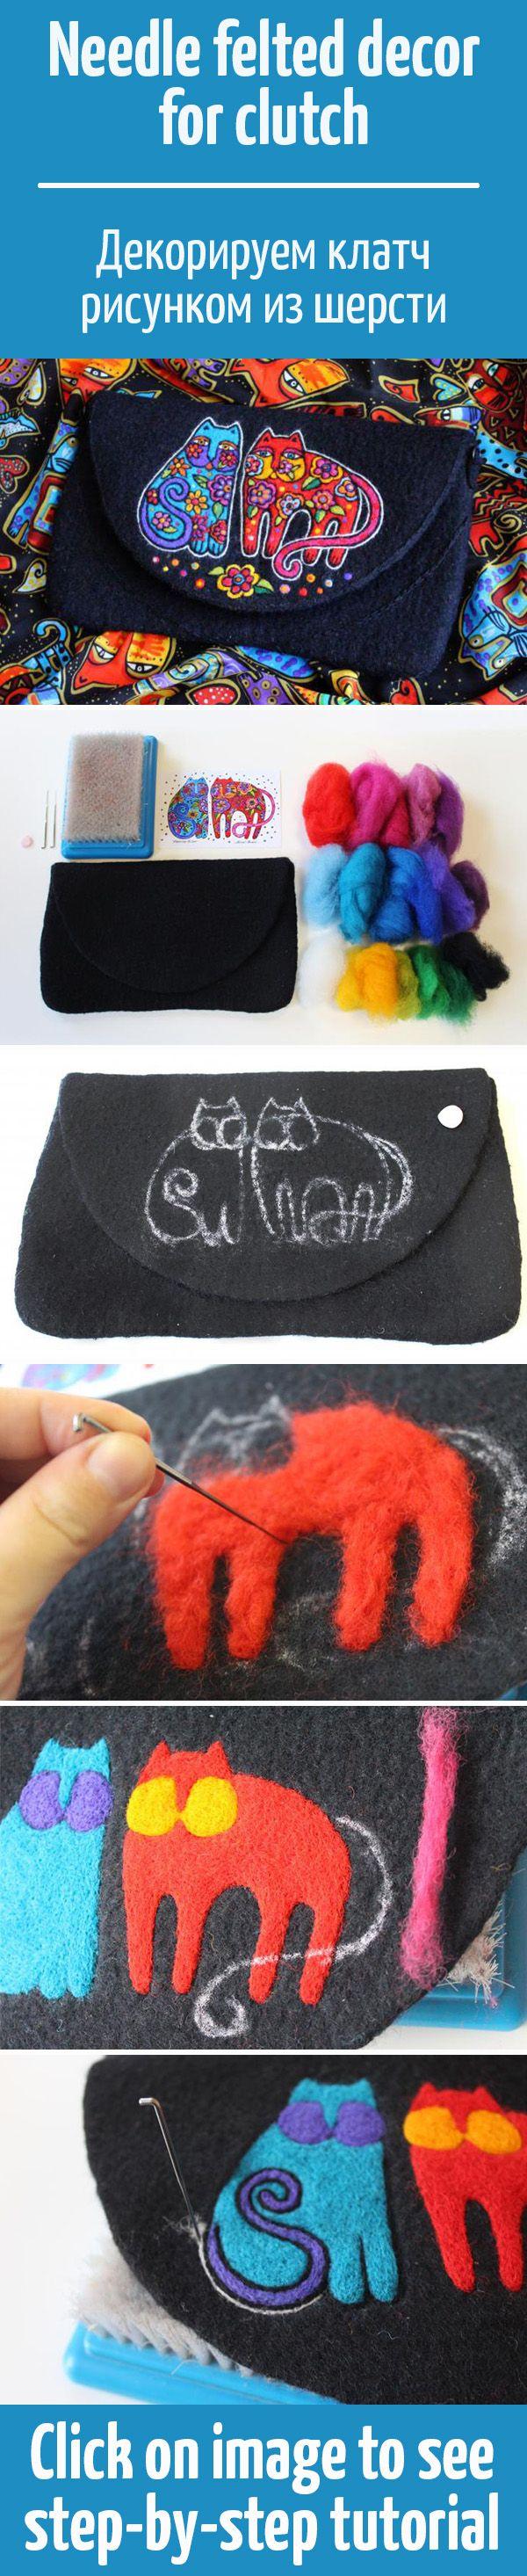 Рисуем шерстью: украшаем валяный клатч ярким мотивом / Decor clutch with needle felted picture